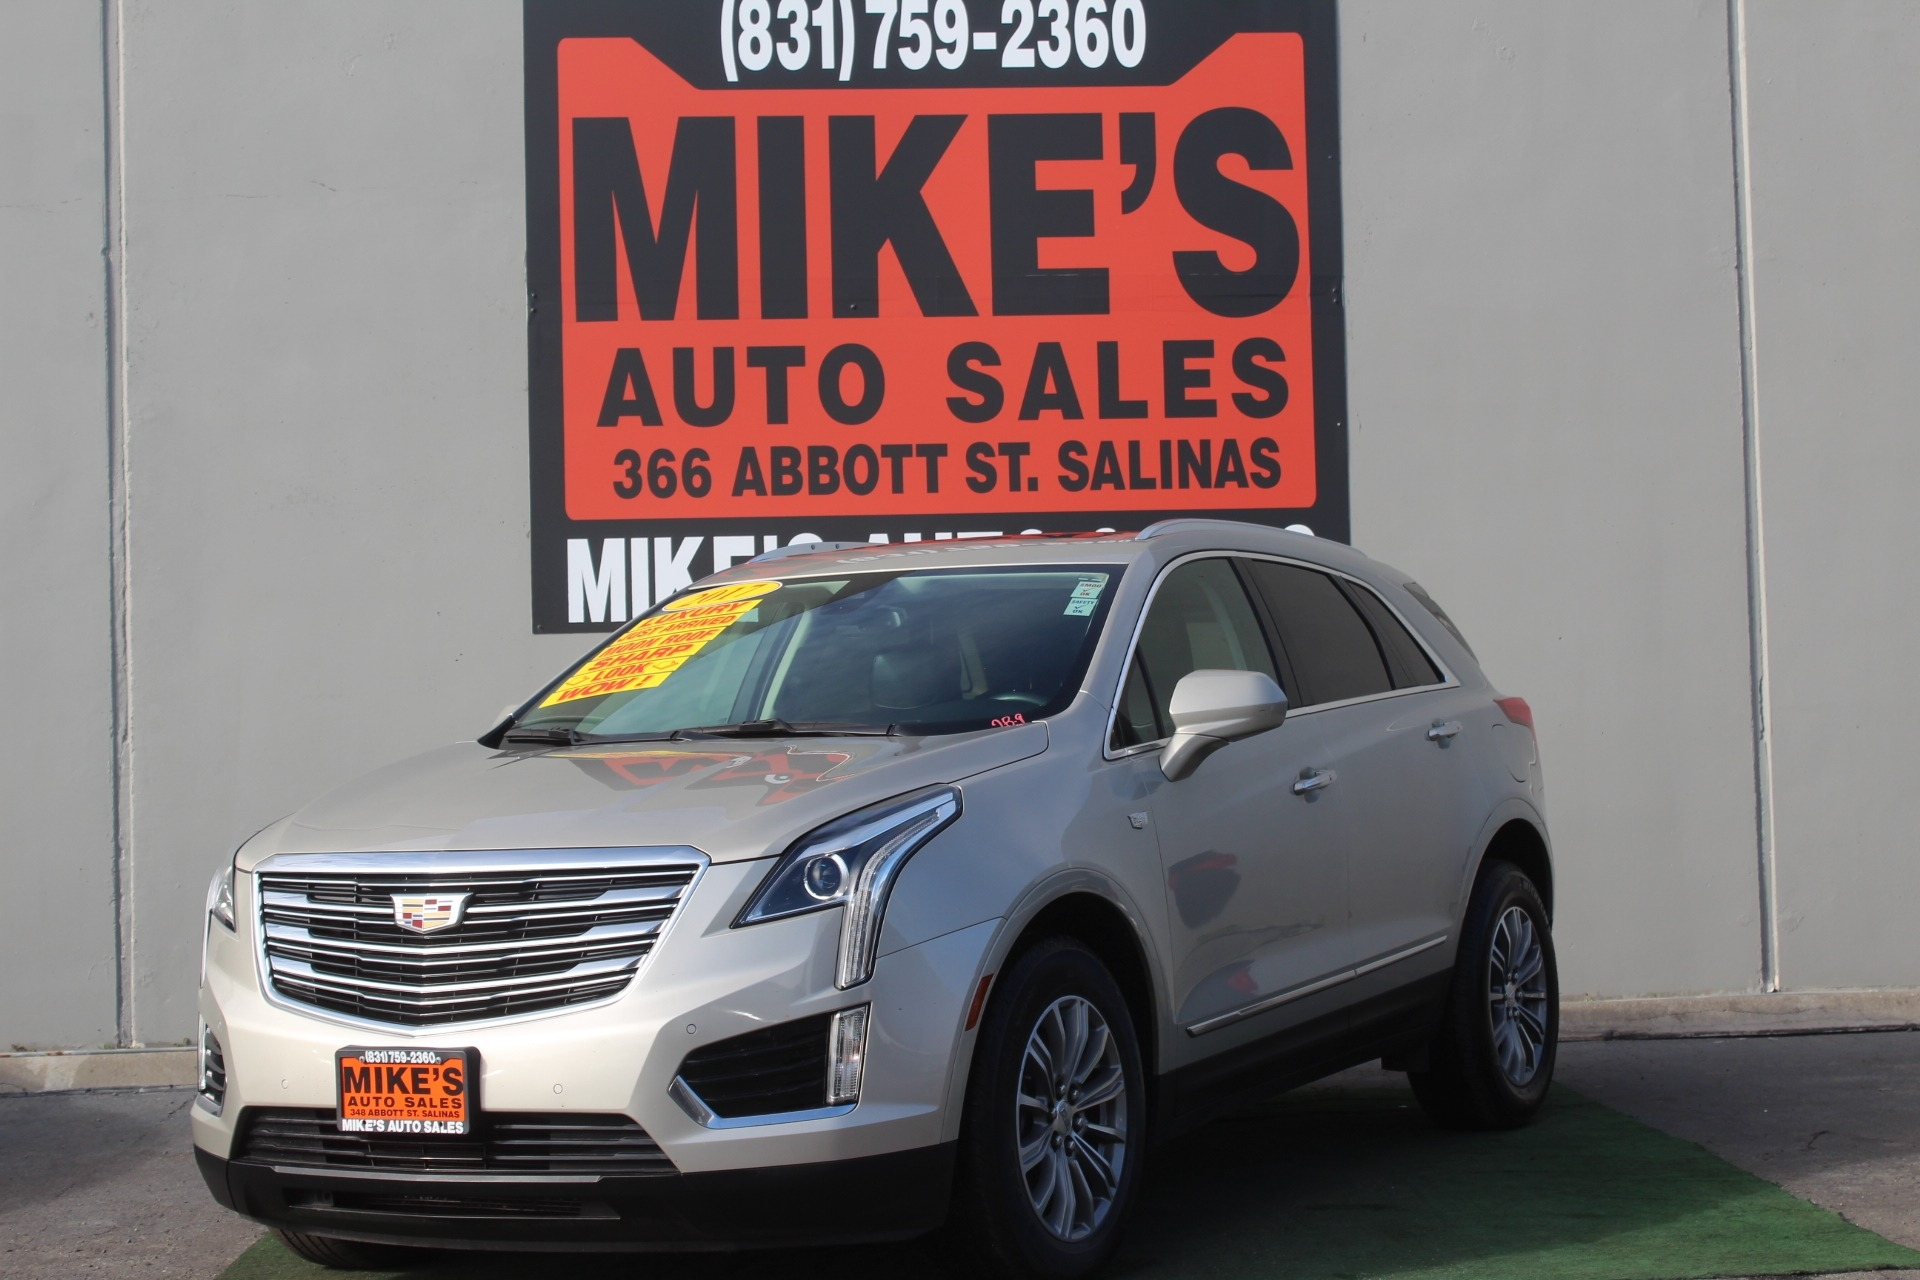 Used 2017 Cadillac XT5 FWD 4dr Luxury in Salinas, CA